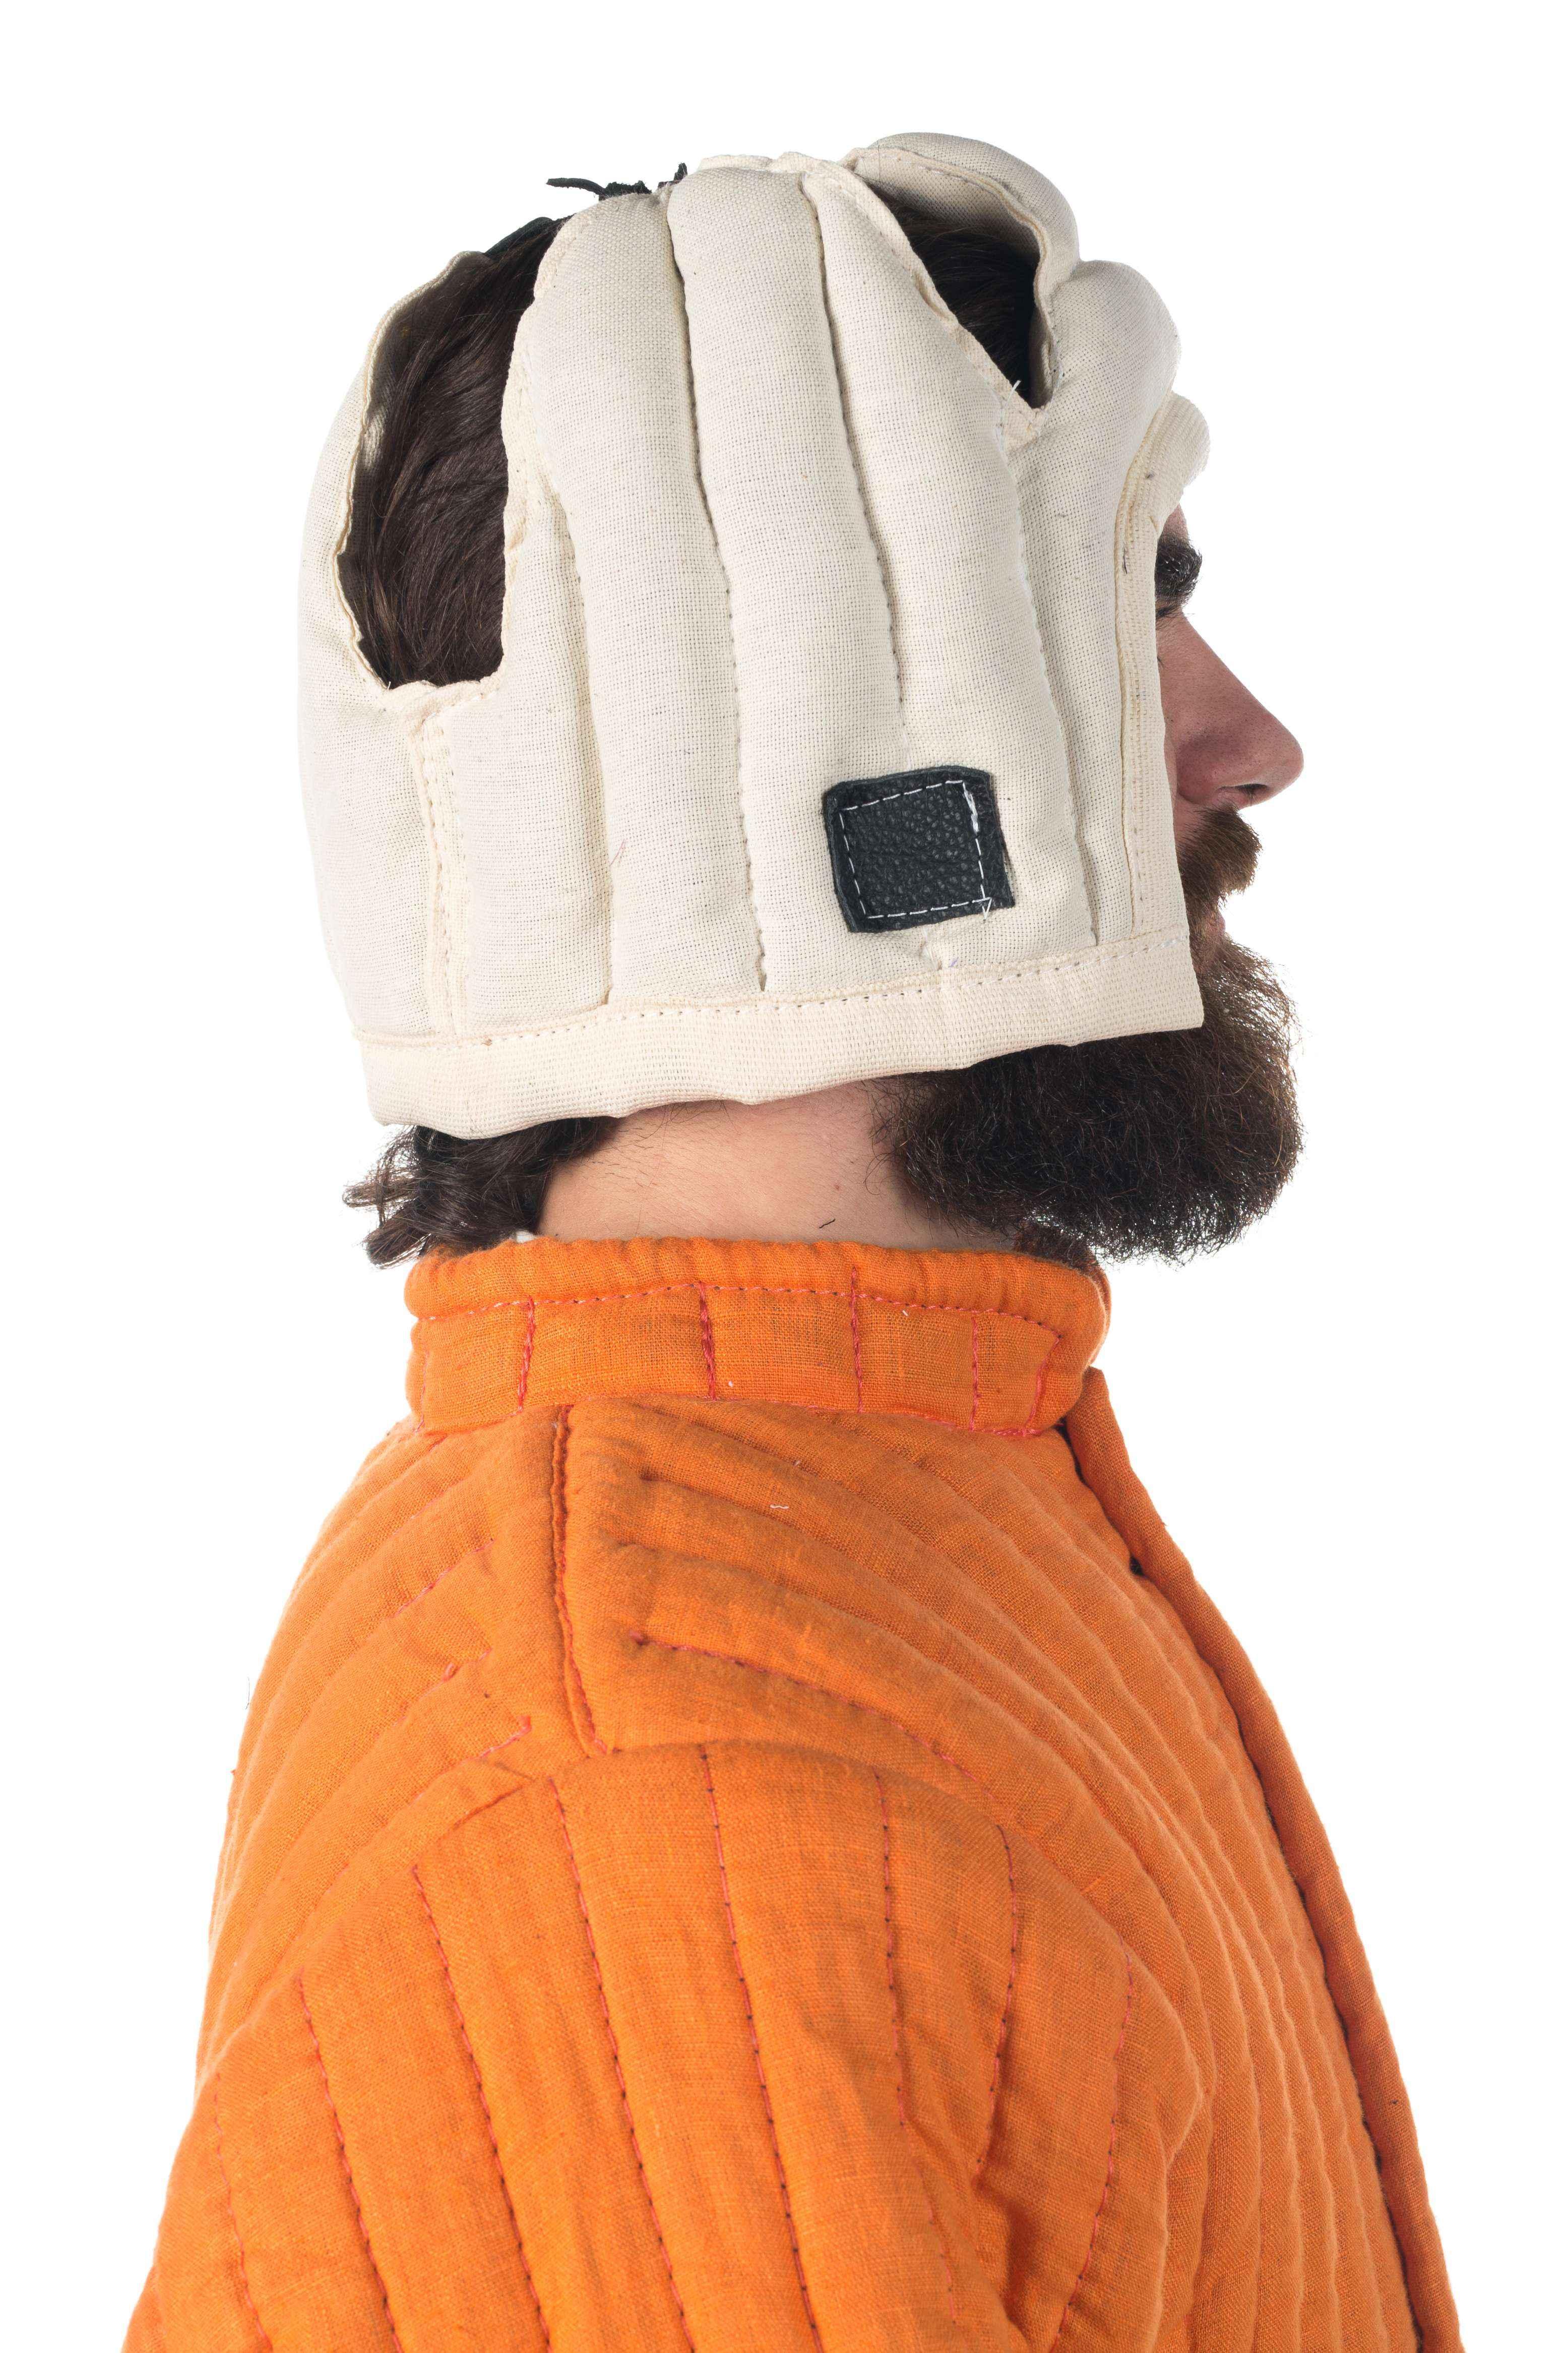 Liner For Bascinet Helmet - for sale armoryworld com